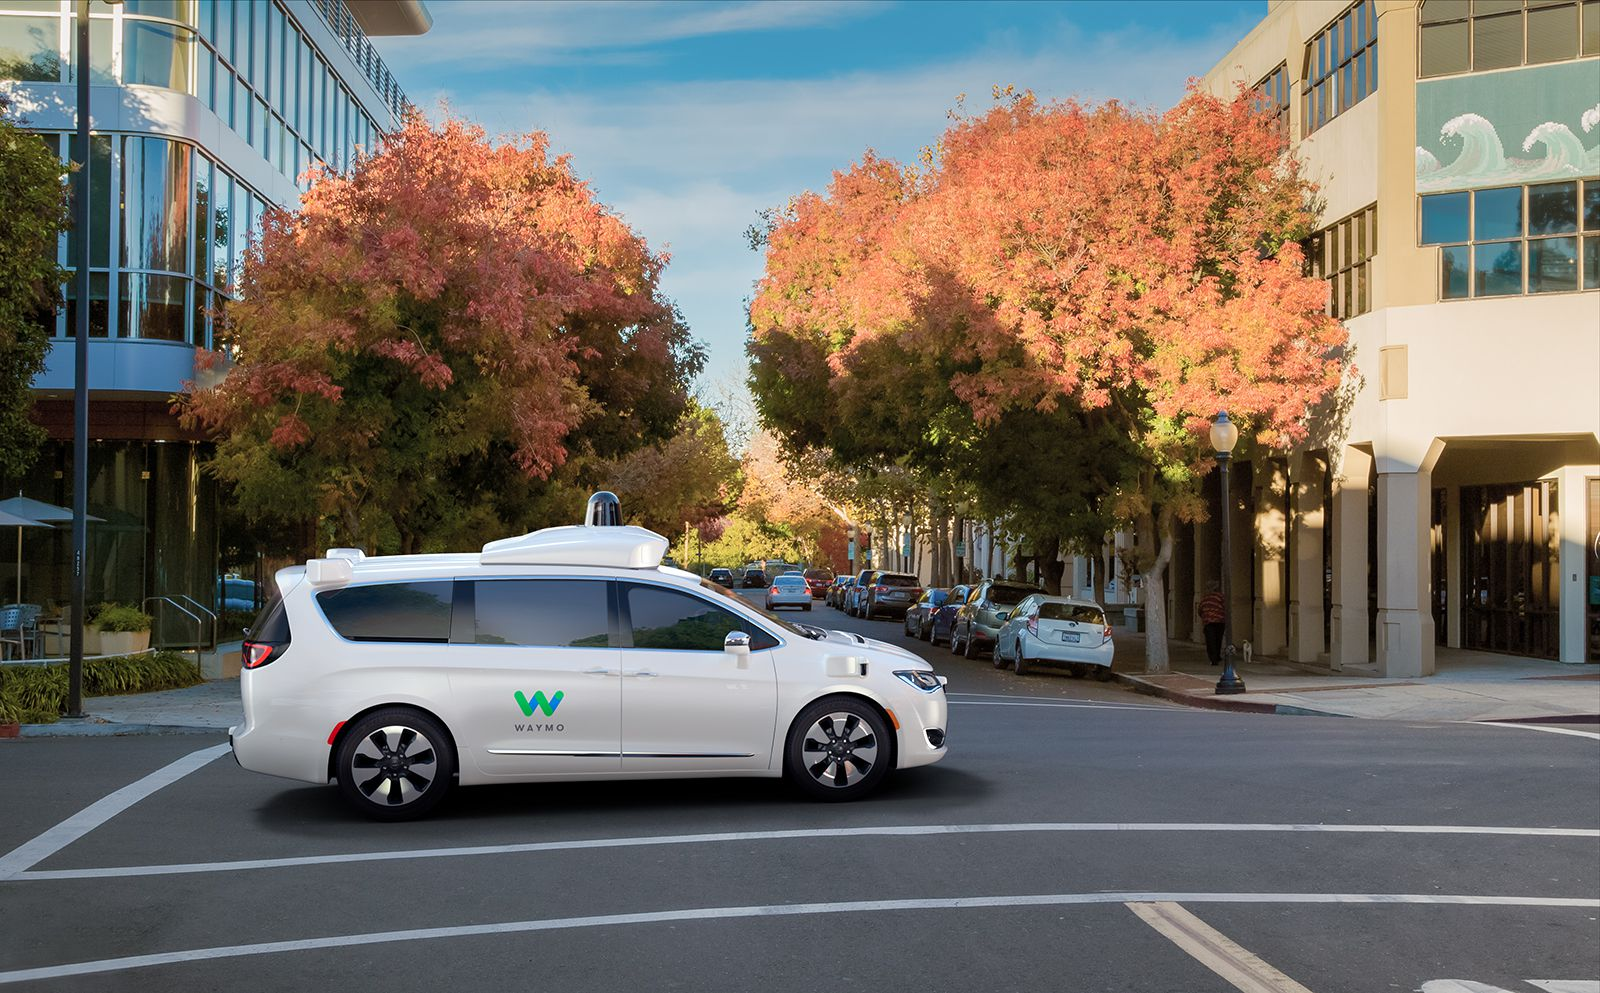 Waymo obtains California permit for fully driverless testing - Axios